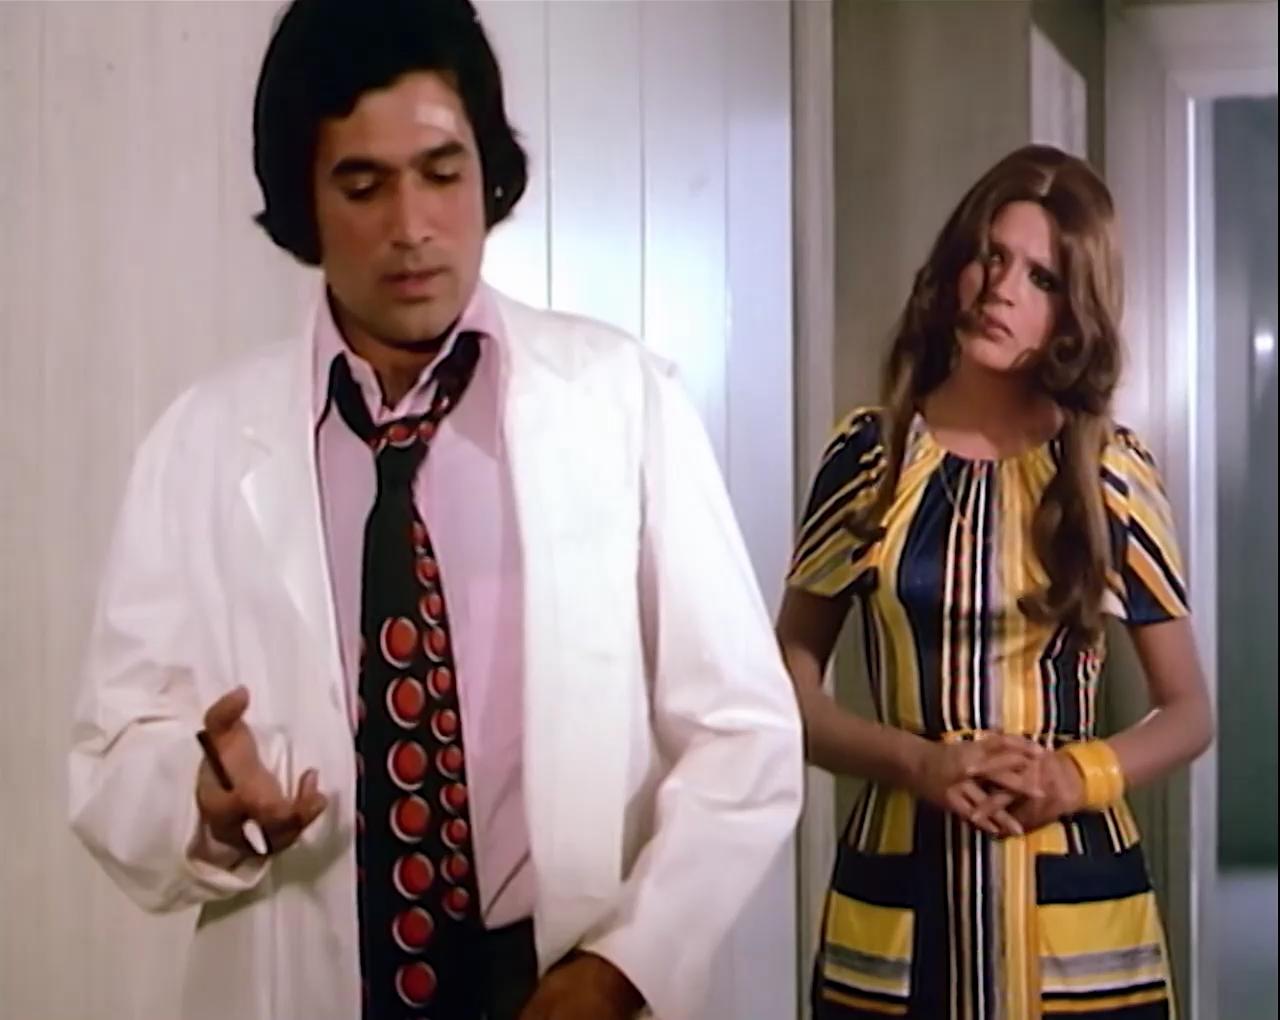 Aashiq.Hoon.Baharon.Ka.1977.WEBRip.AVC.AAC.1080p_DusIcTv[(094802)07-19-09].JPG